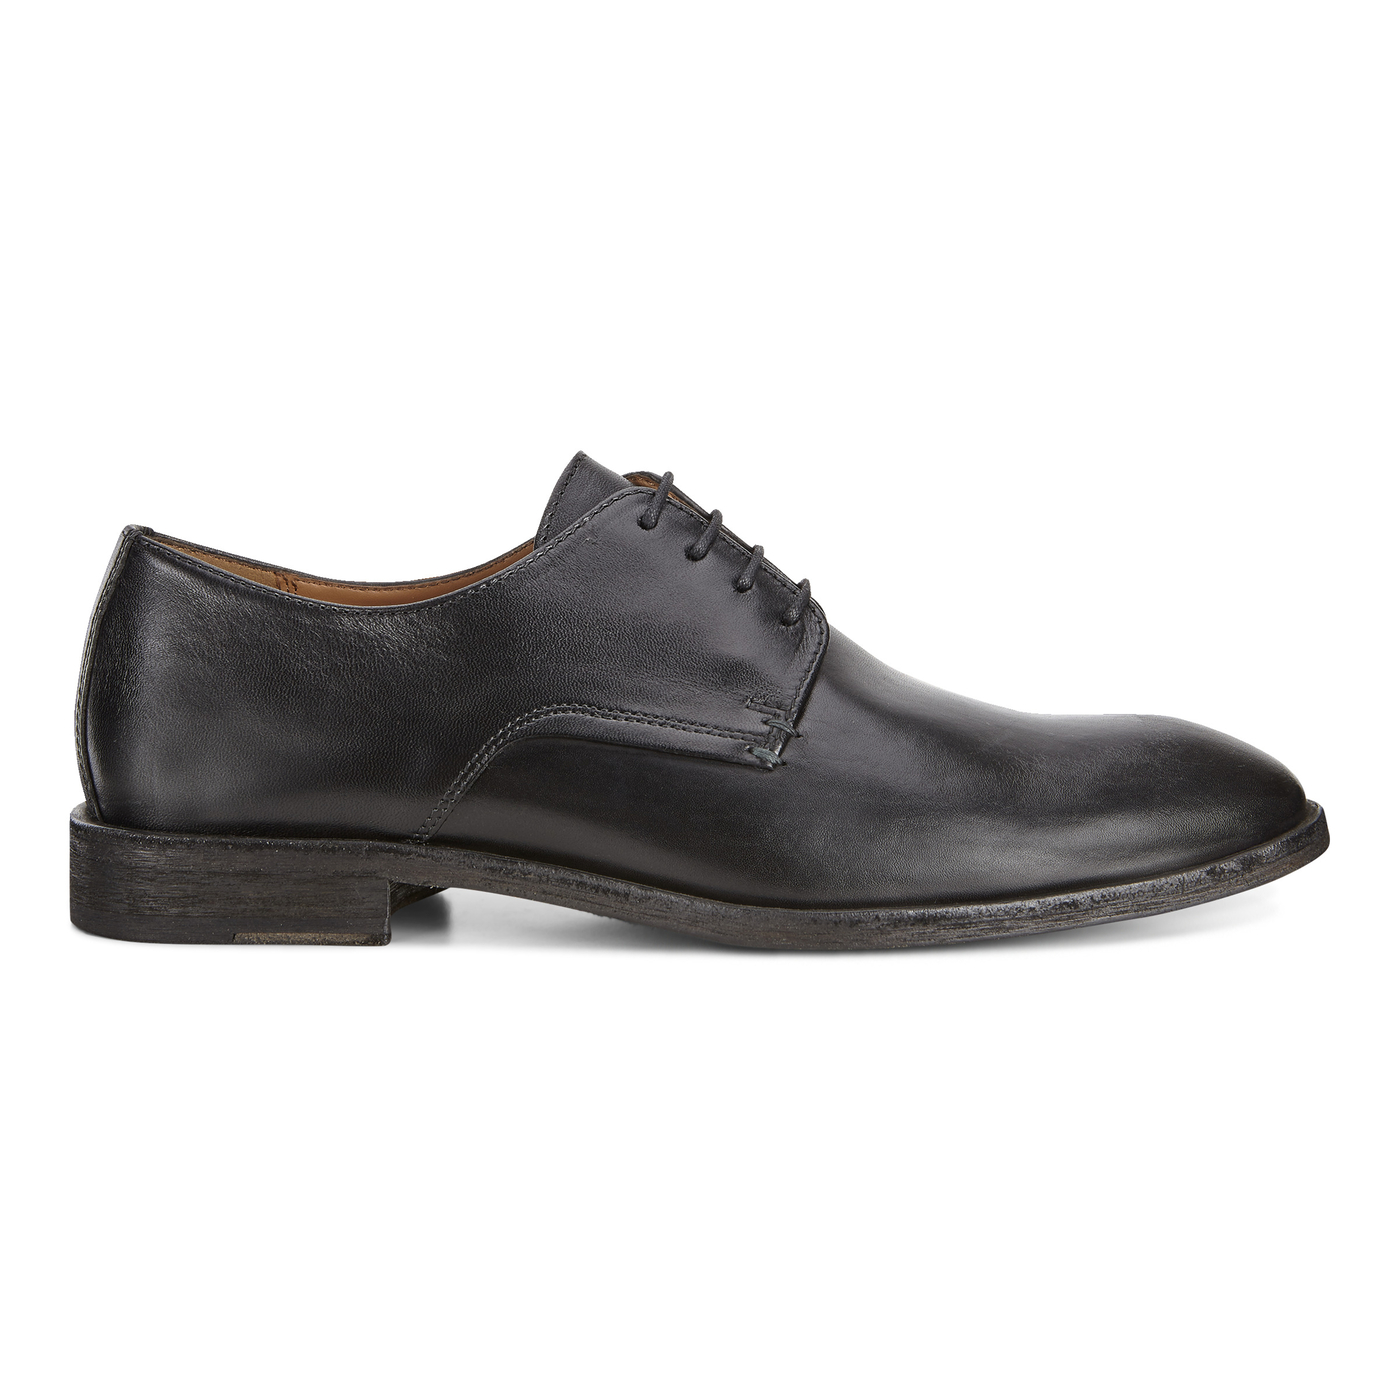 017097a6d0 ECCO Leeds Plain Toe Tie | Men's Formal Shoes | ECCO® Shoes